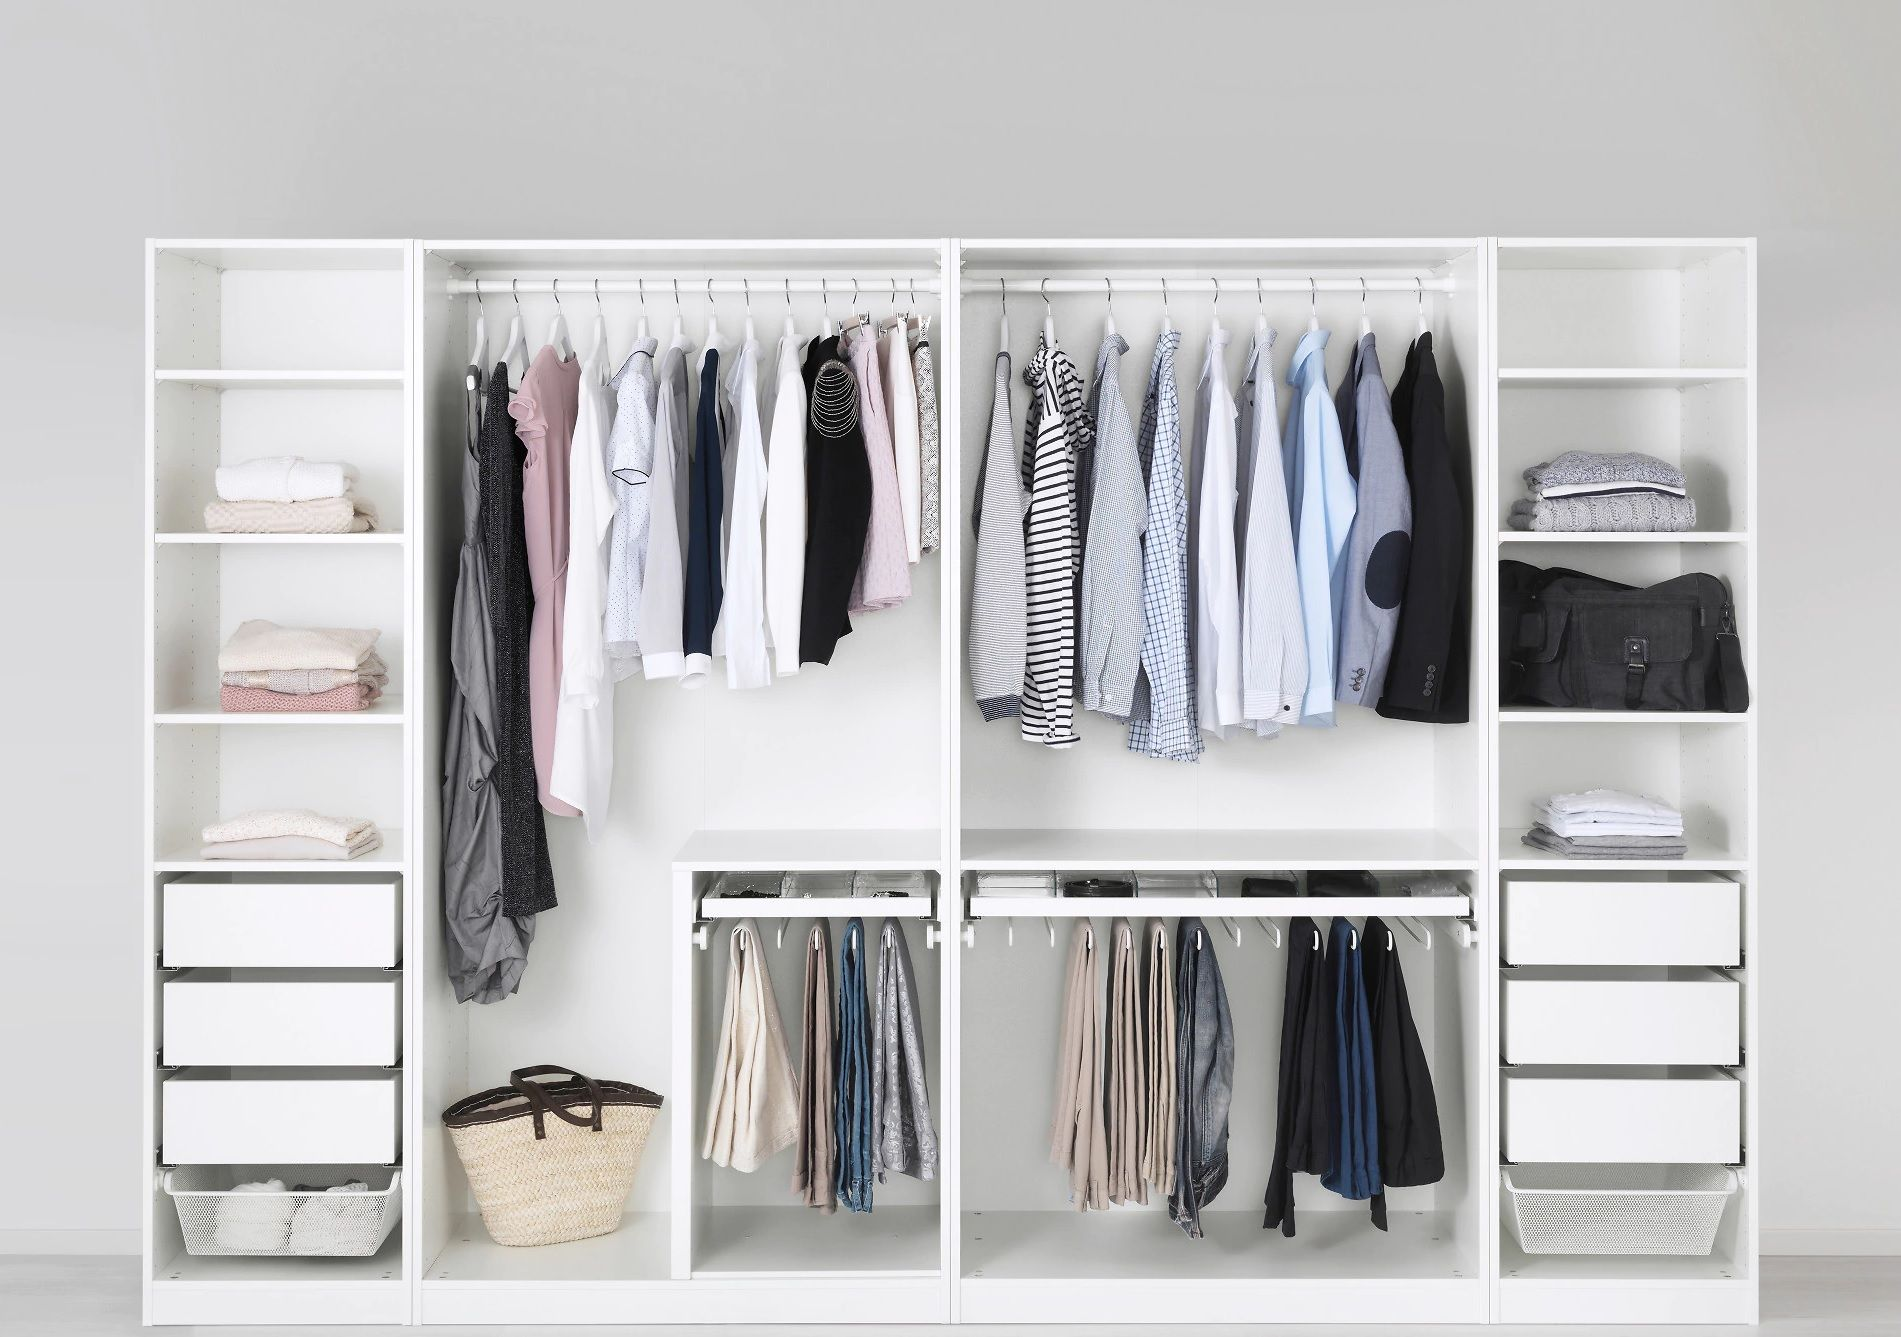 pax ikea armadi ante scorrevoli ikea pax armadio for sale ikea pax closet 250x60x236 montreux. Black Bedroom Furniture Sets. Home Design Ideas